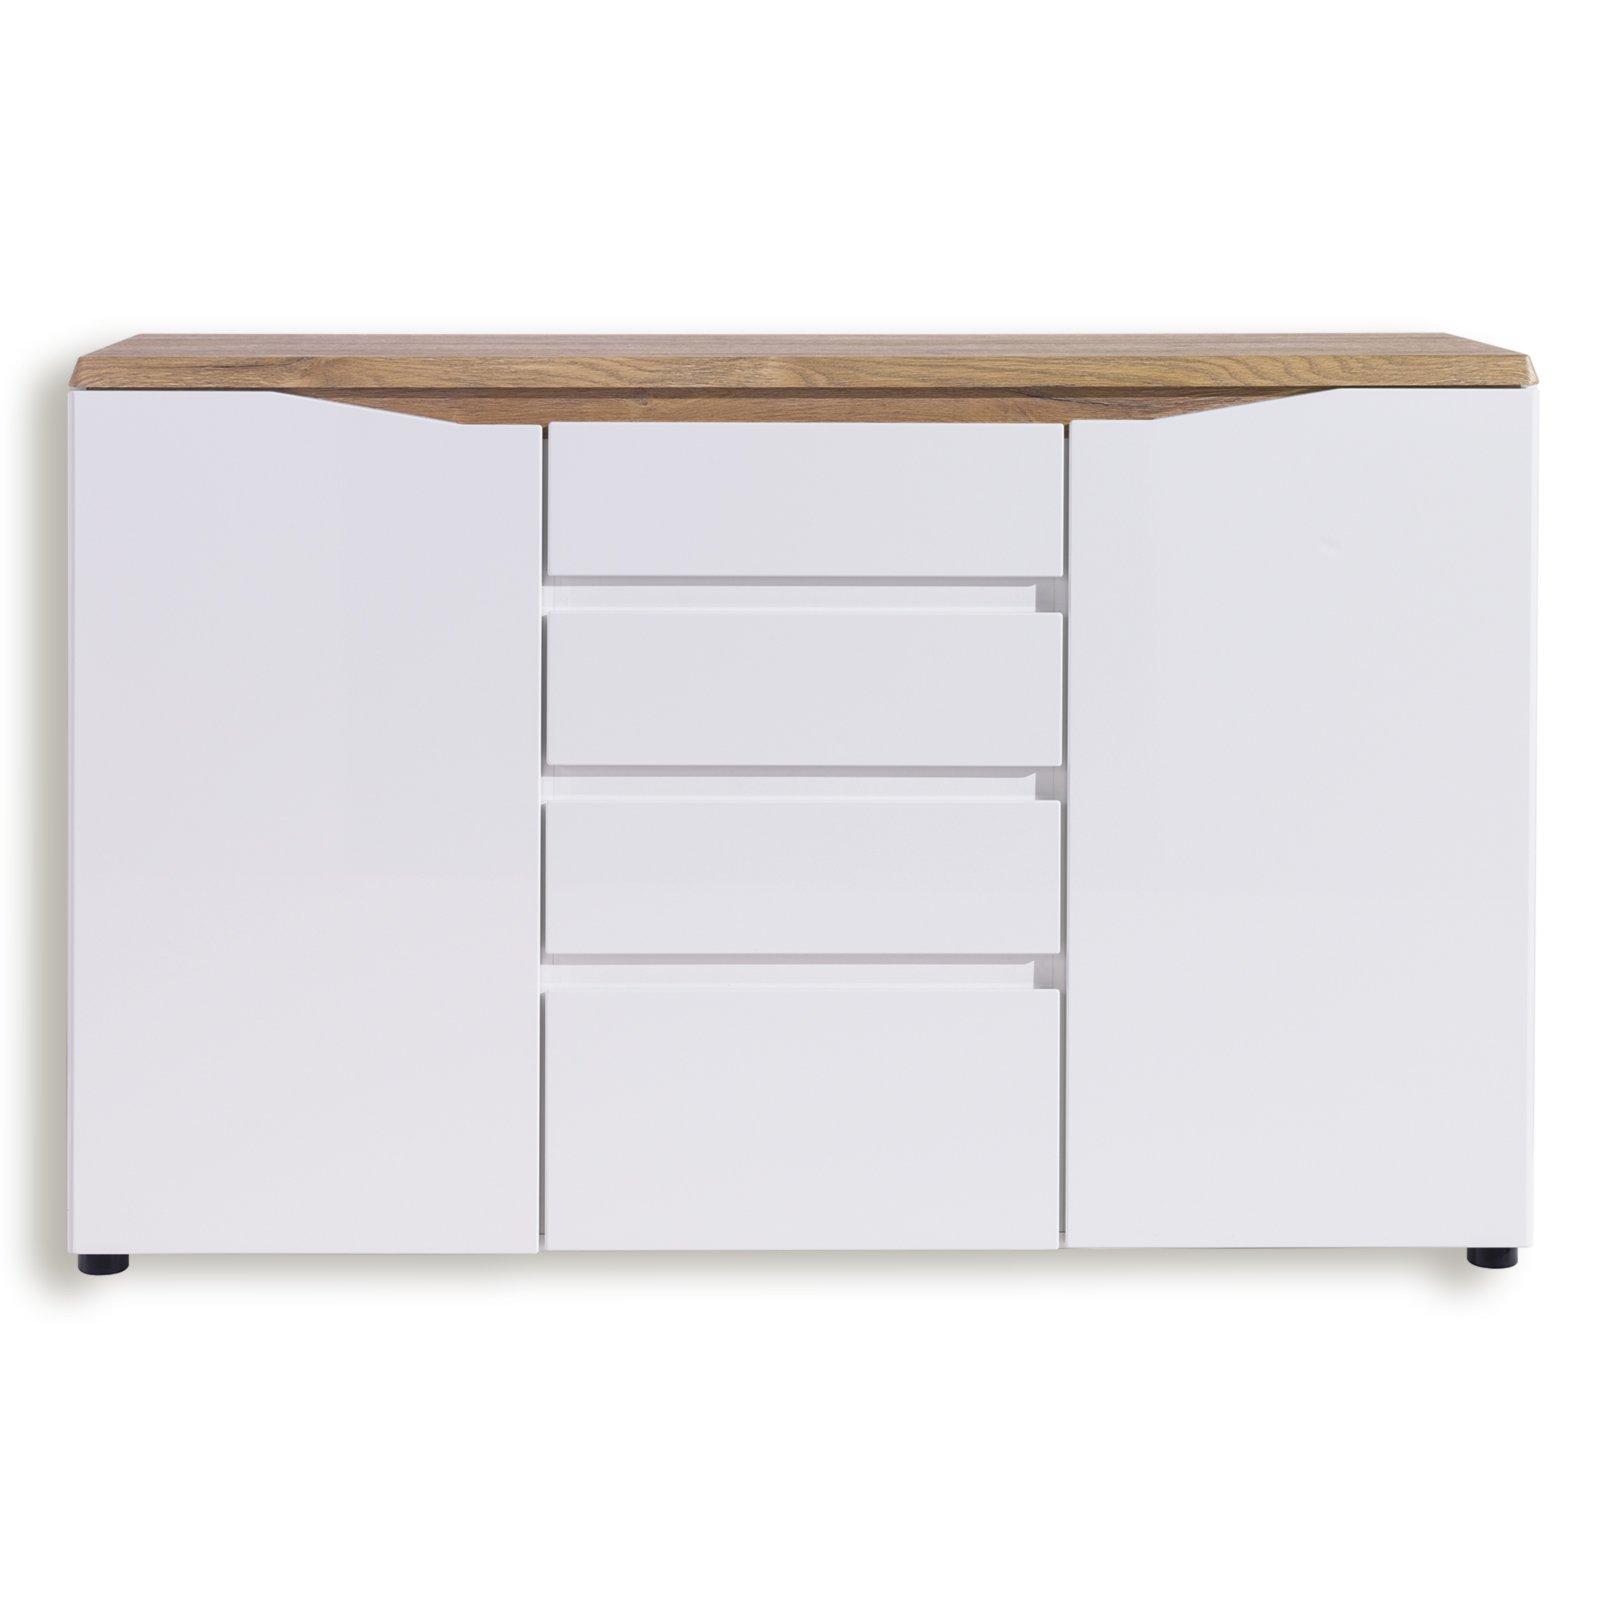 kommode malaga wei alteiche 140 cm kommoden sideboards m bel roller m belhaus. Black Bedroom Furniture Sets. Home Design Ideas